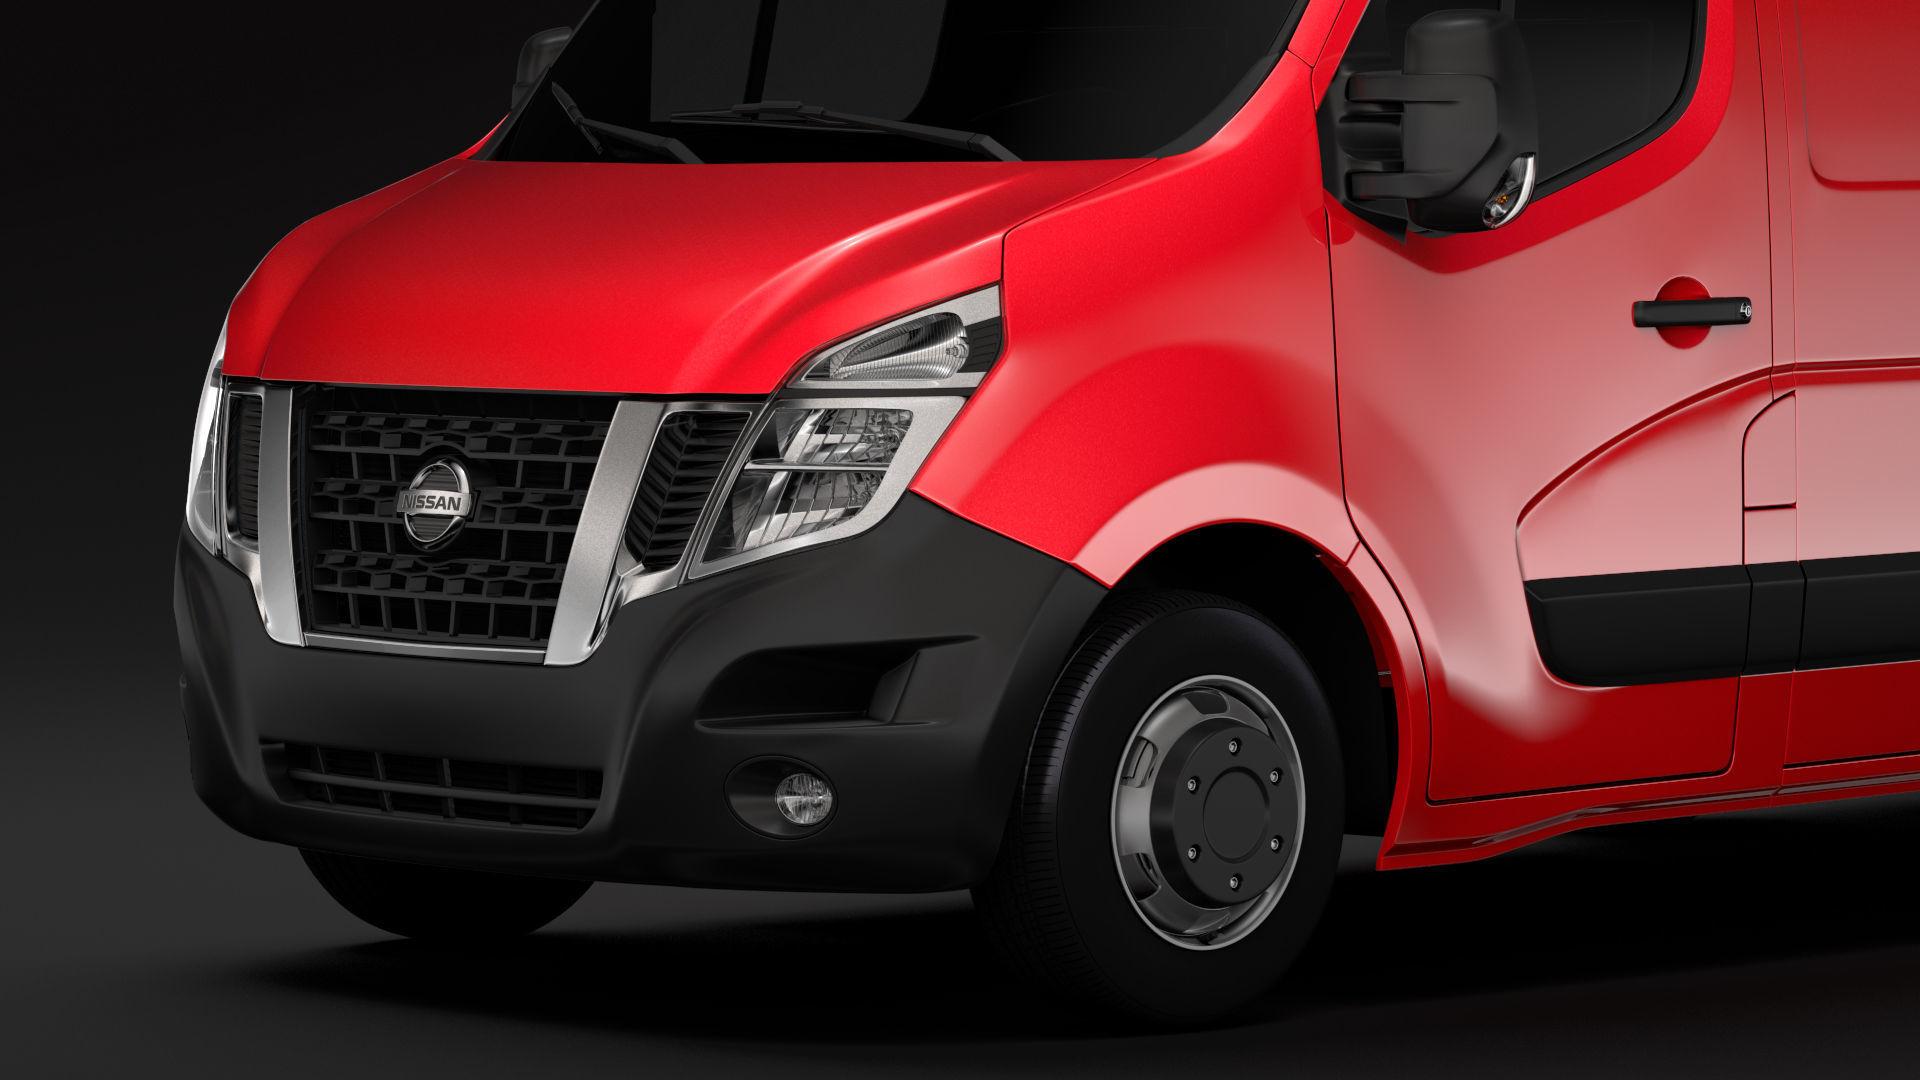 Nissan Nv 400 L1h2 Van 2017 3d Model Cgtrader